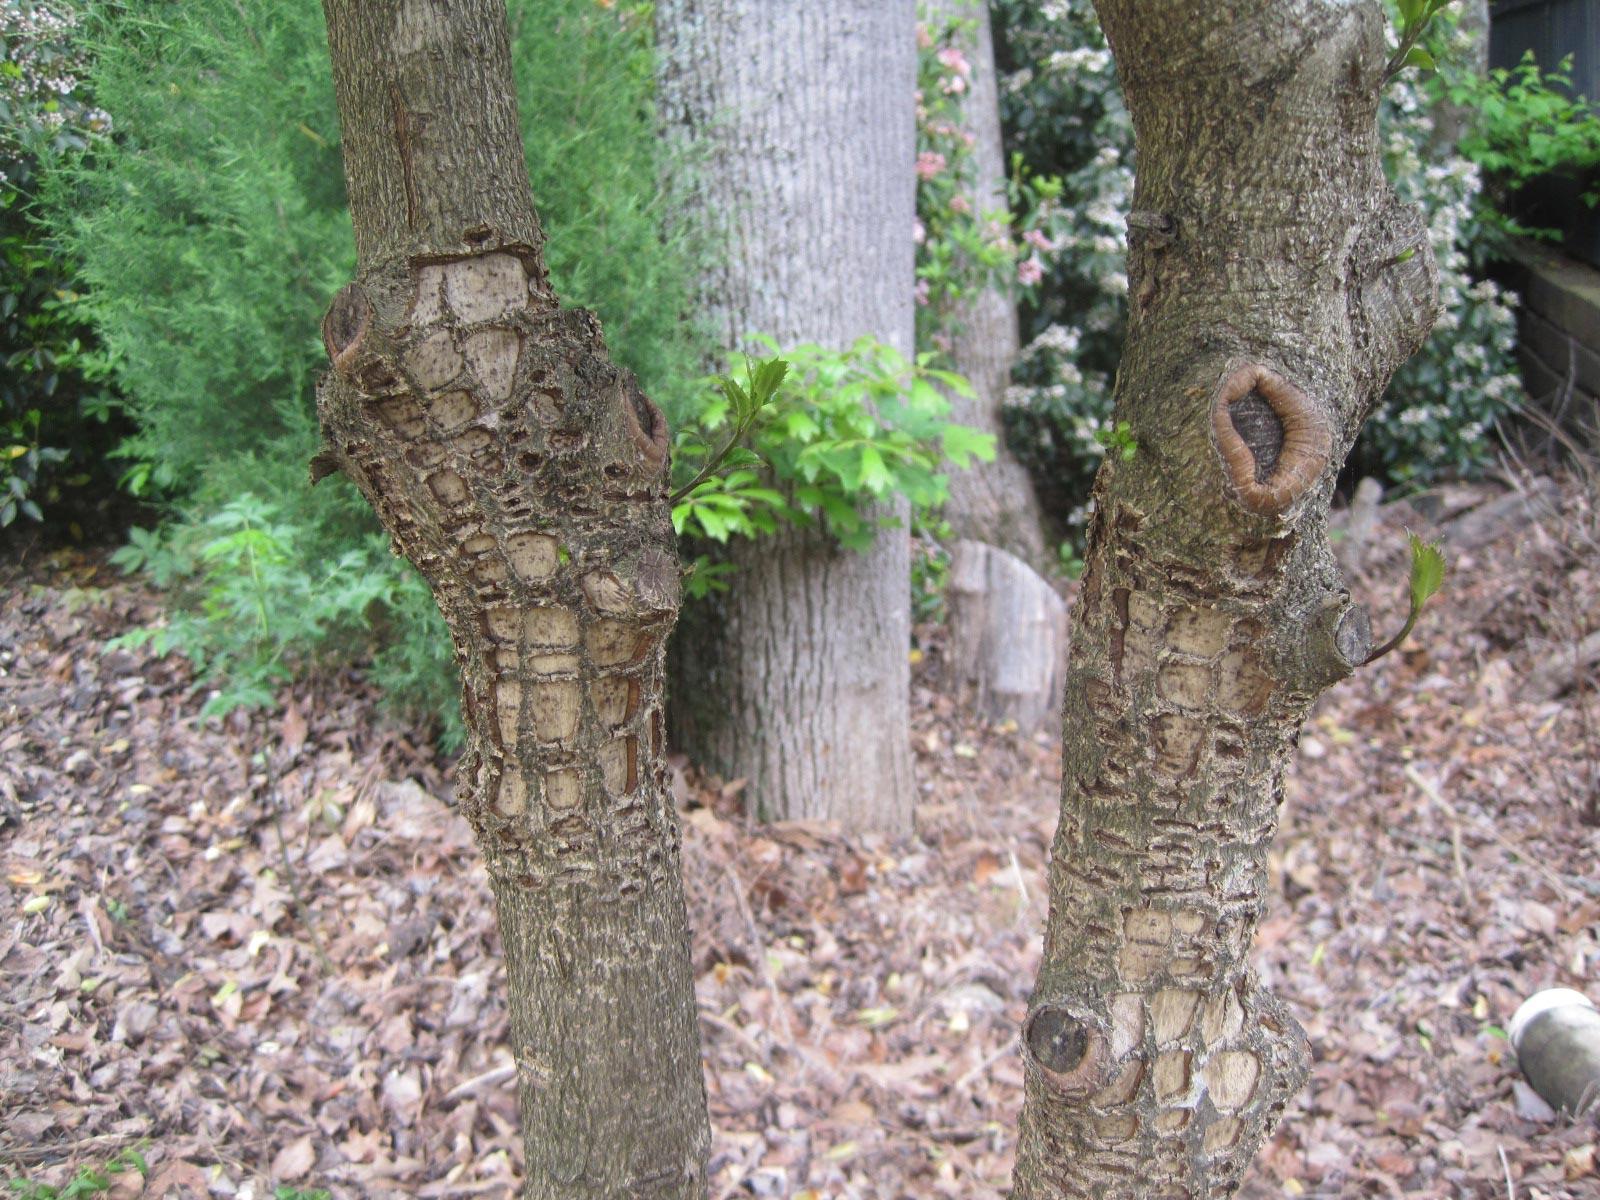 squirrel damage